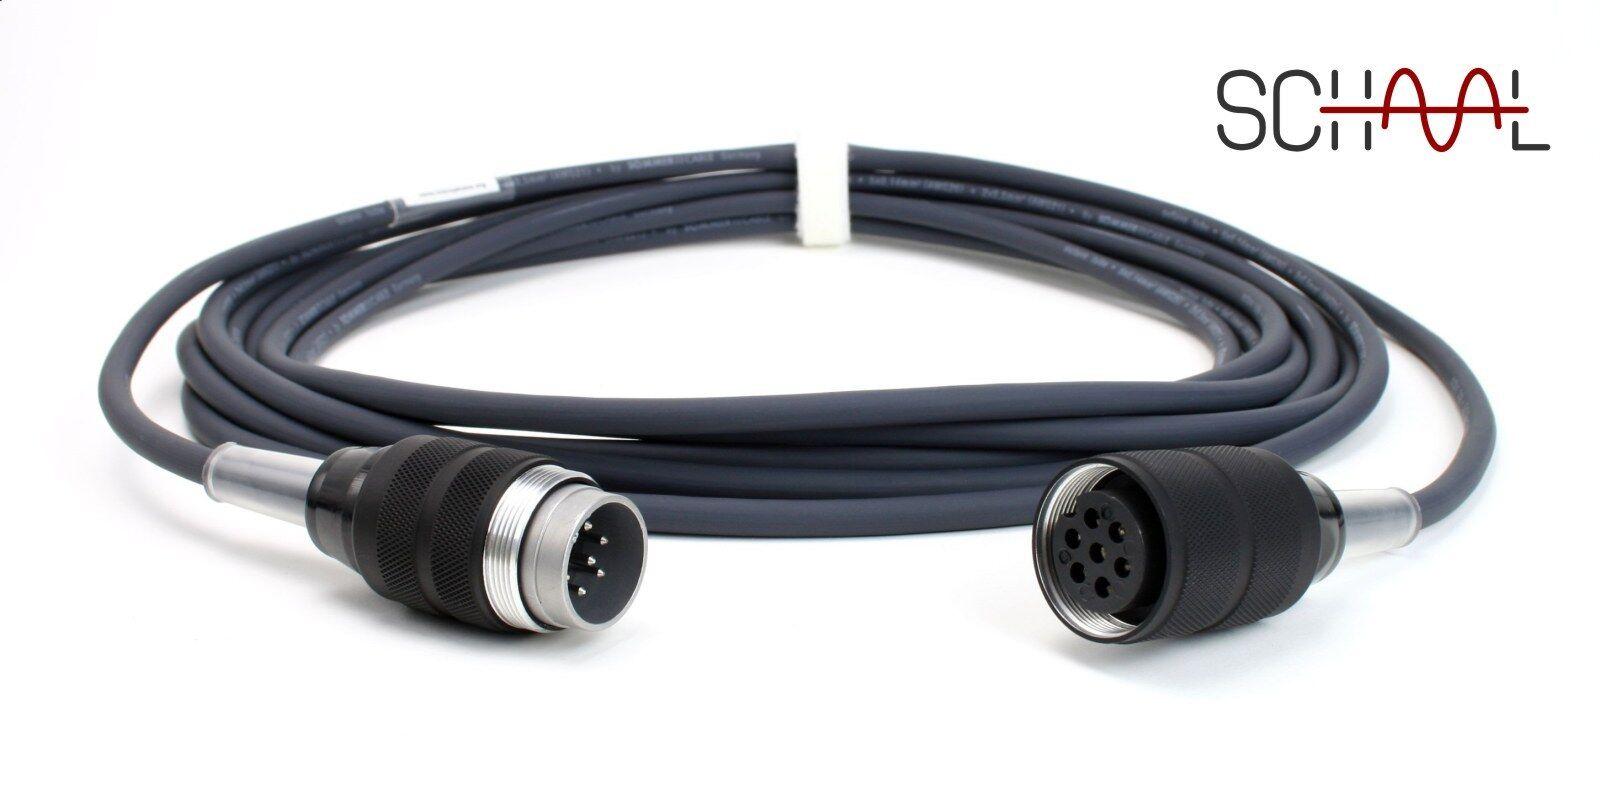 Kabel cable für Neumann M249 M250 M269 KM254 KM253 KM256 KM264 KM263 - Lucas CS